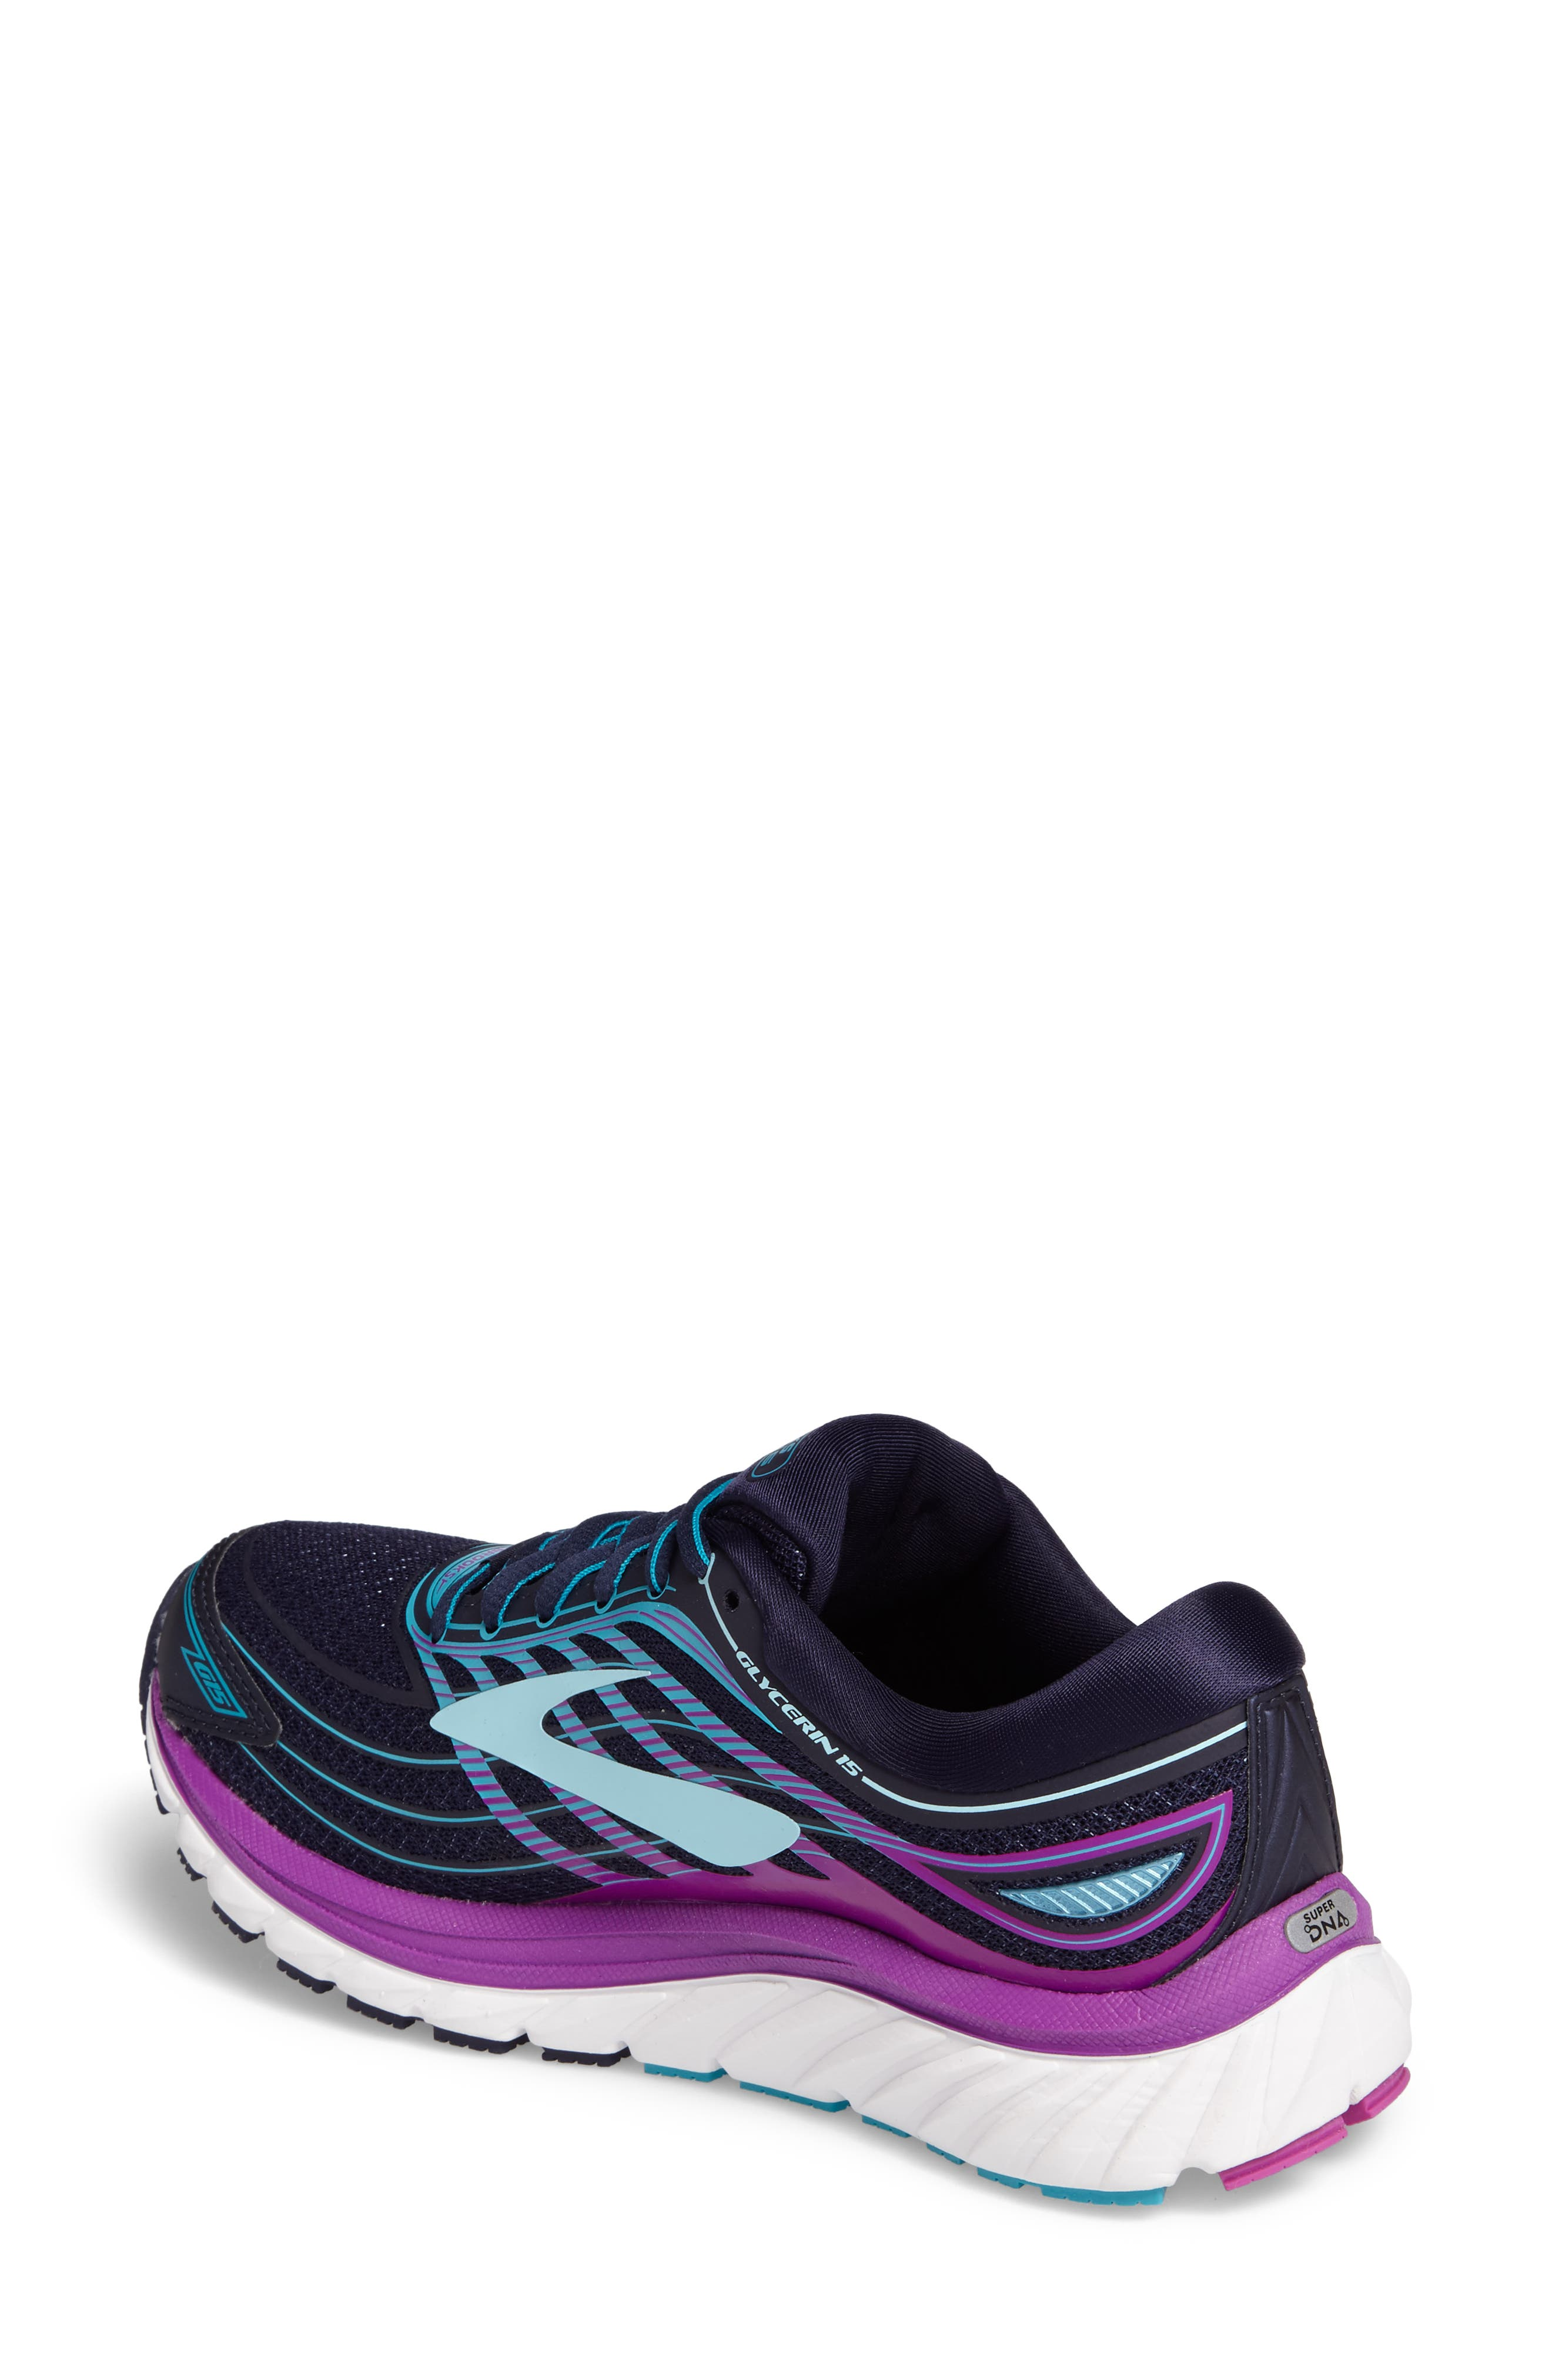 Glycerin 15 Running Shoe,                             Alternate thumbnail 7, color,